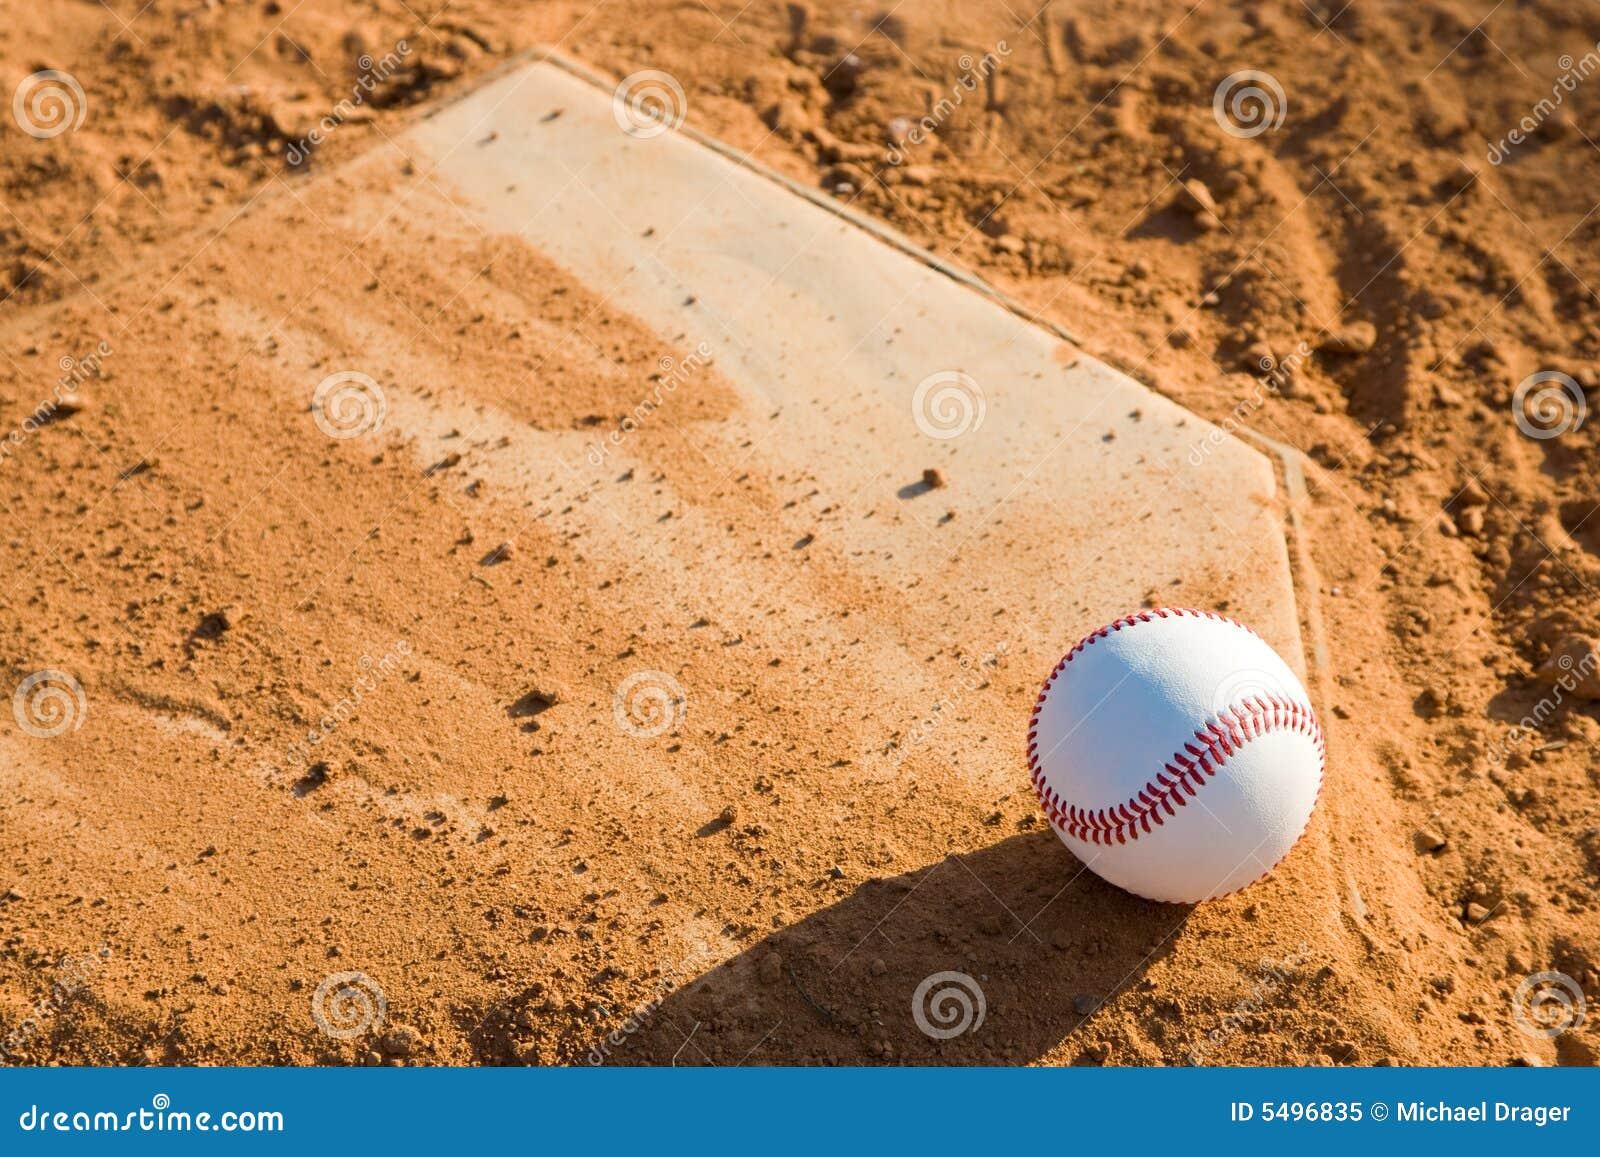 Baseball Homeplate With Baseball On It Stock Image - Image ...